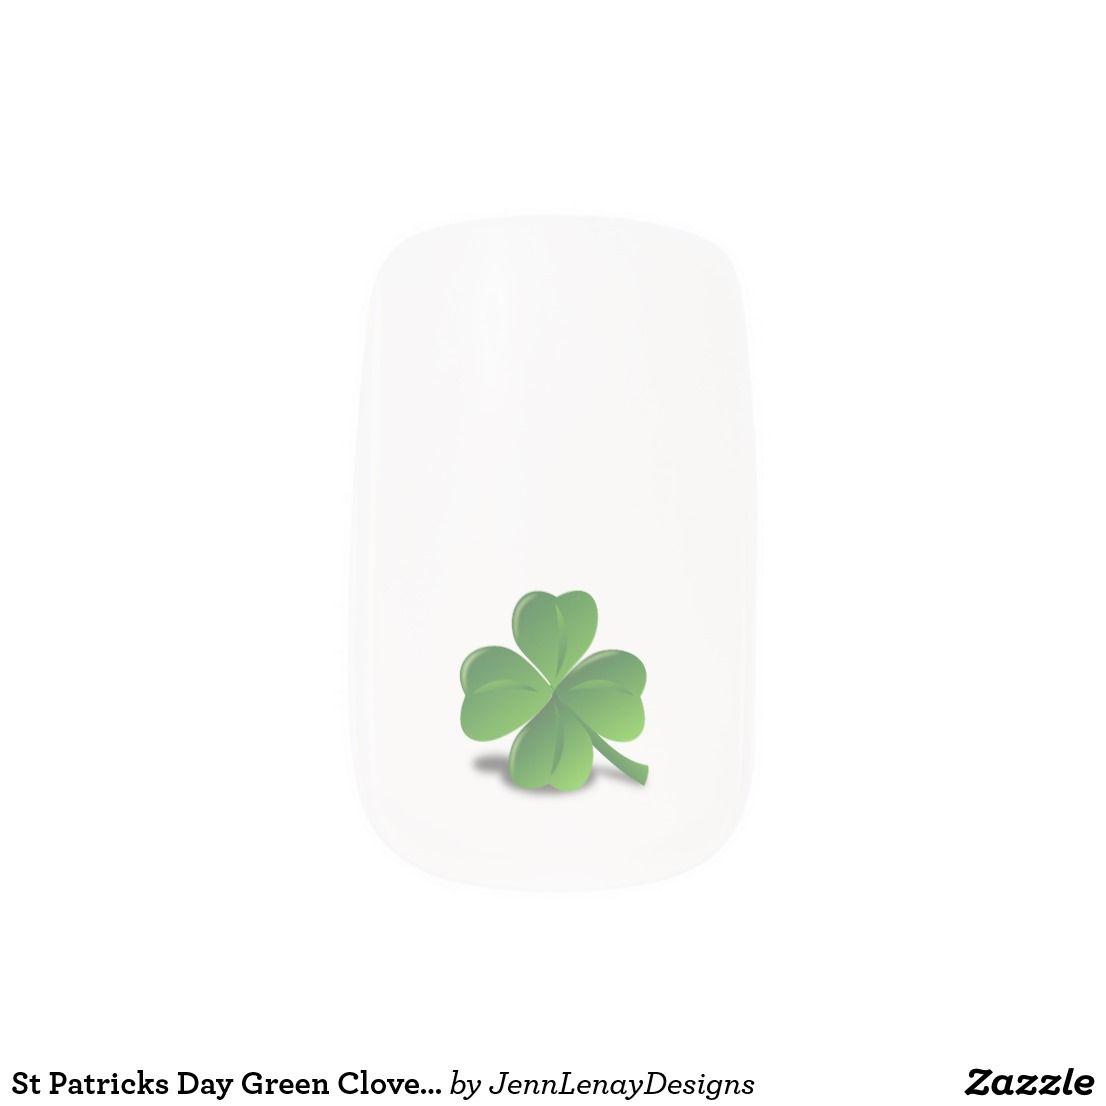 St Patricks Day Green Clover Shamrock Minx Nail Art   Zazzle.com